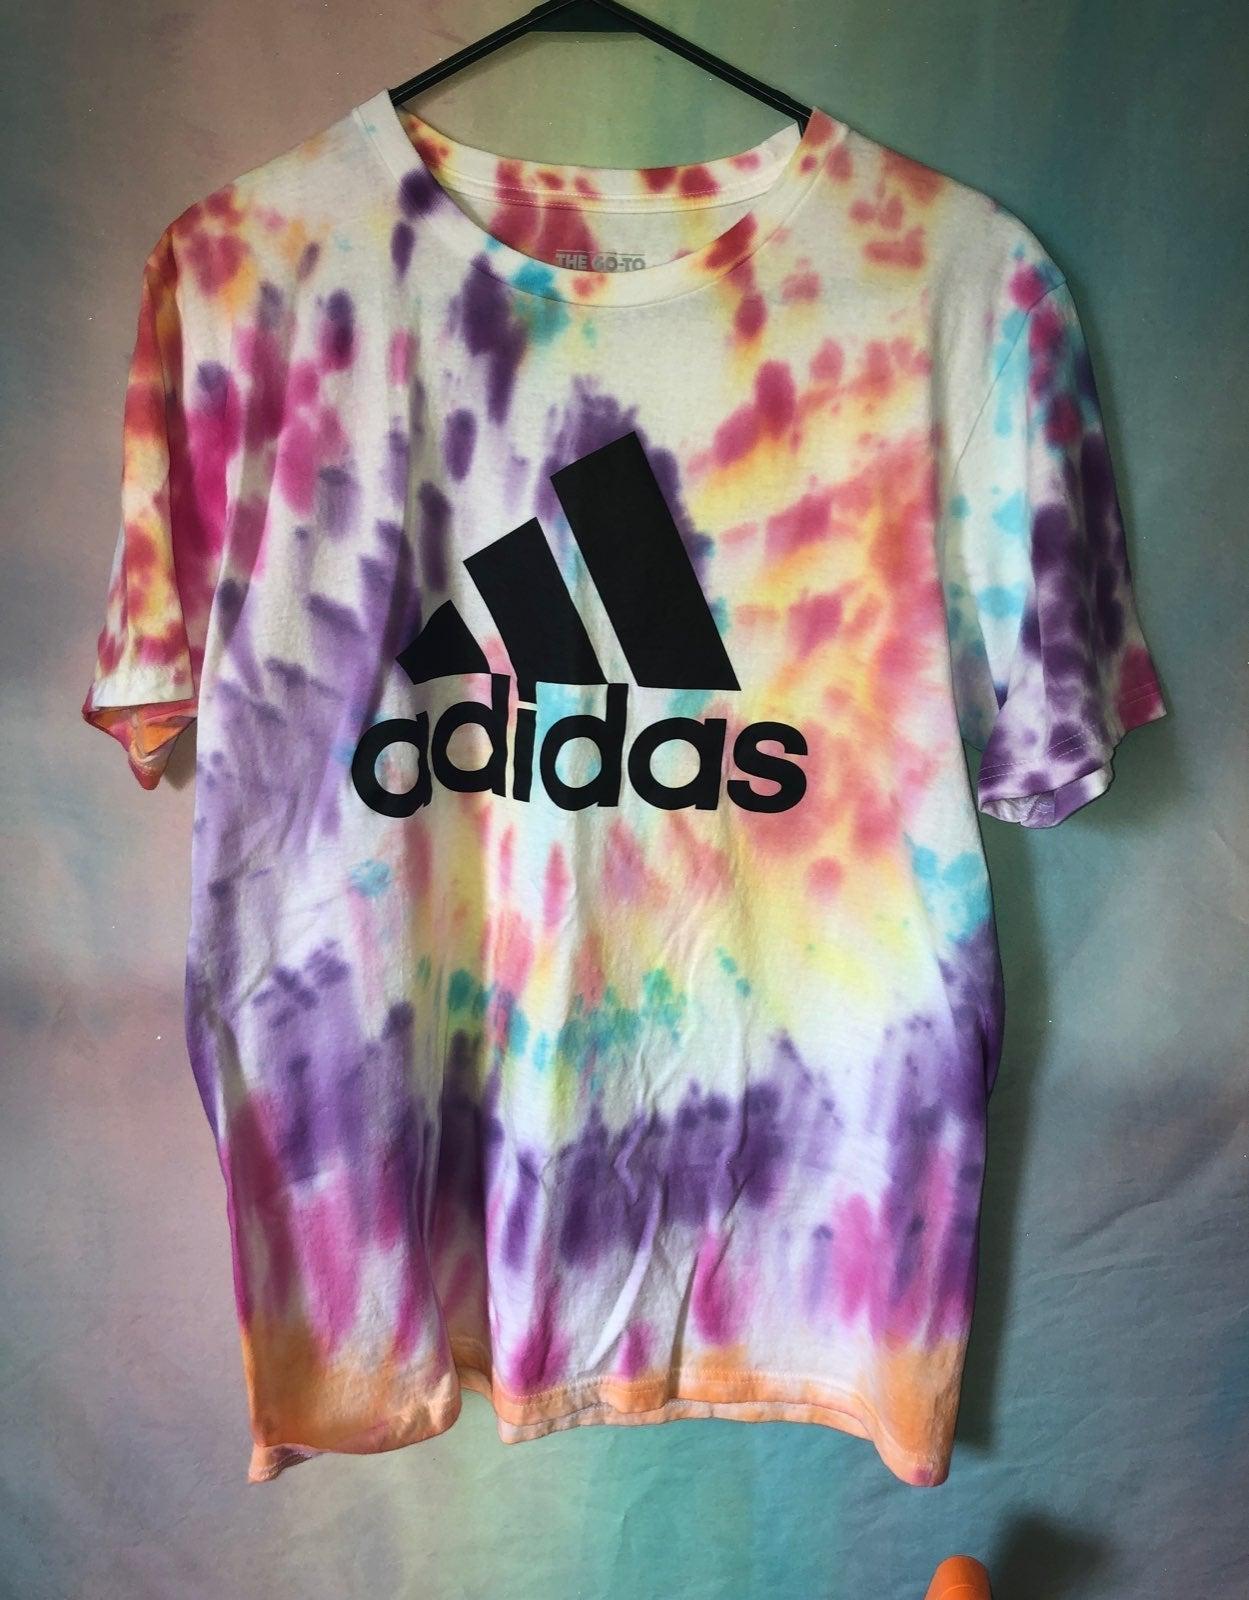 Adidas tie dye shirt